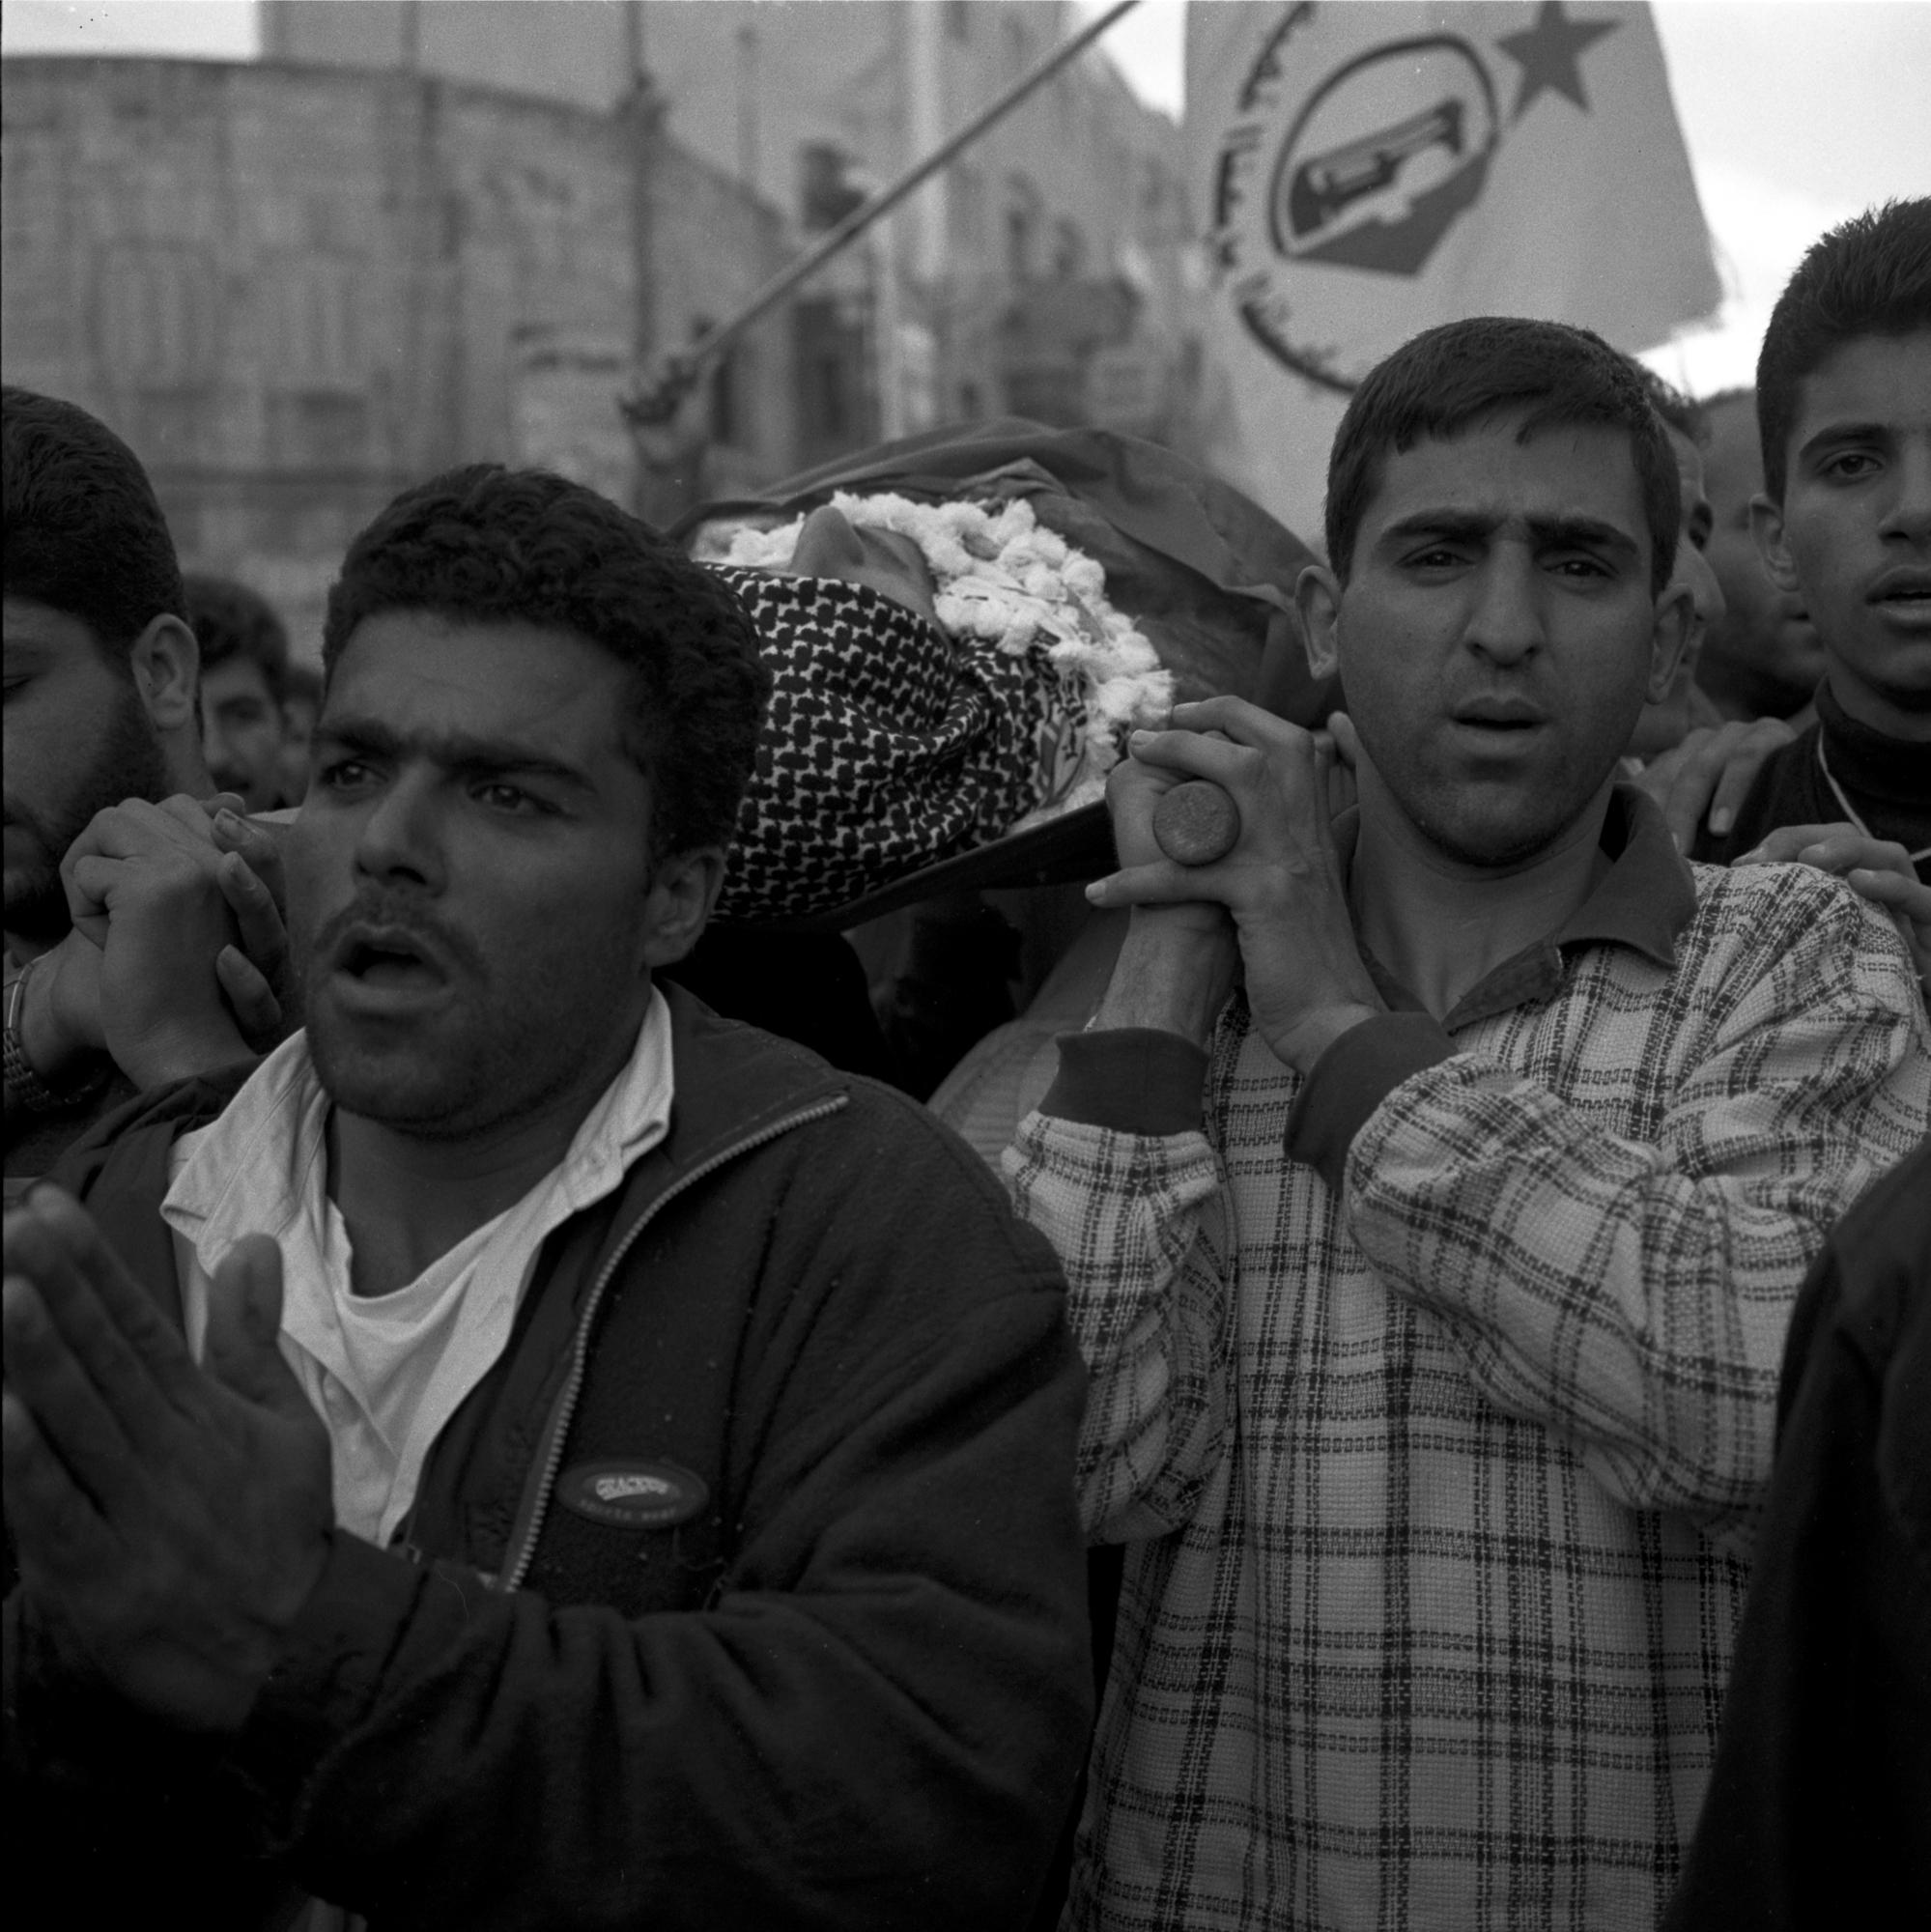 Funerals, Bethlehem 2002